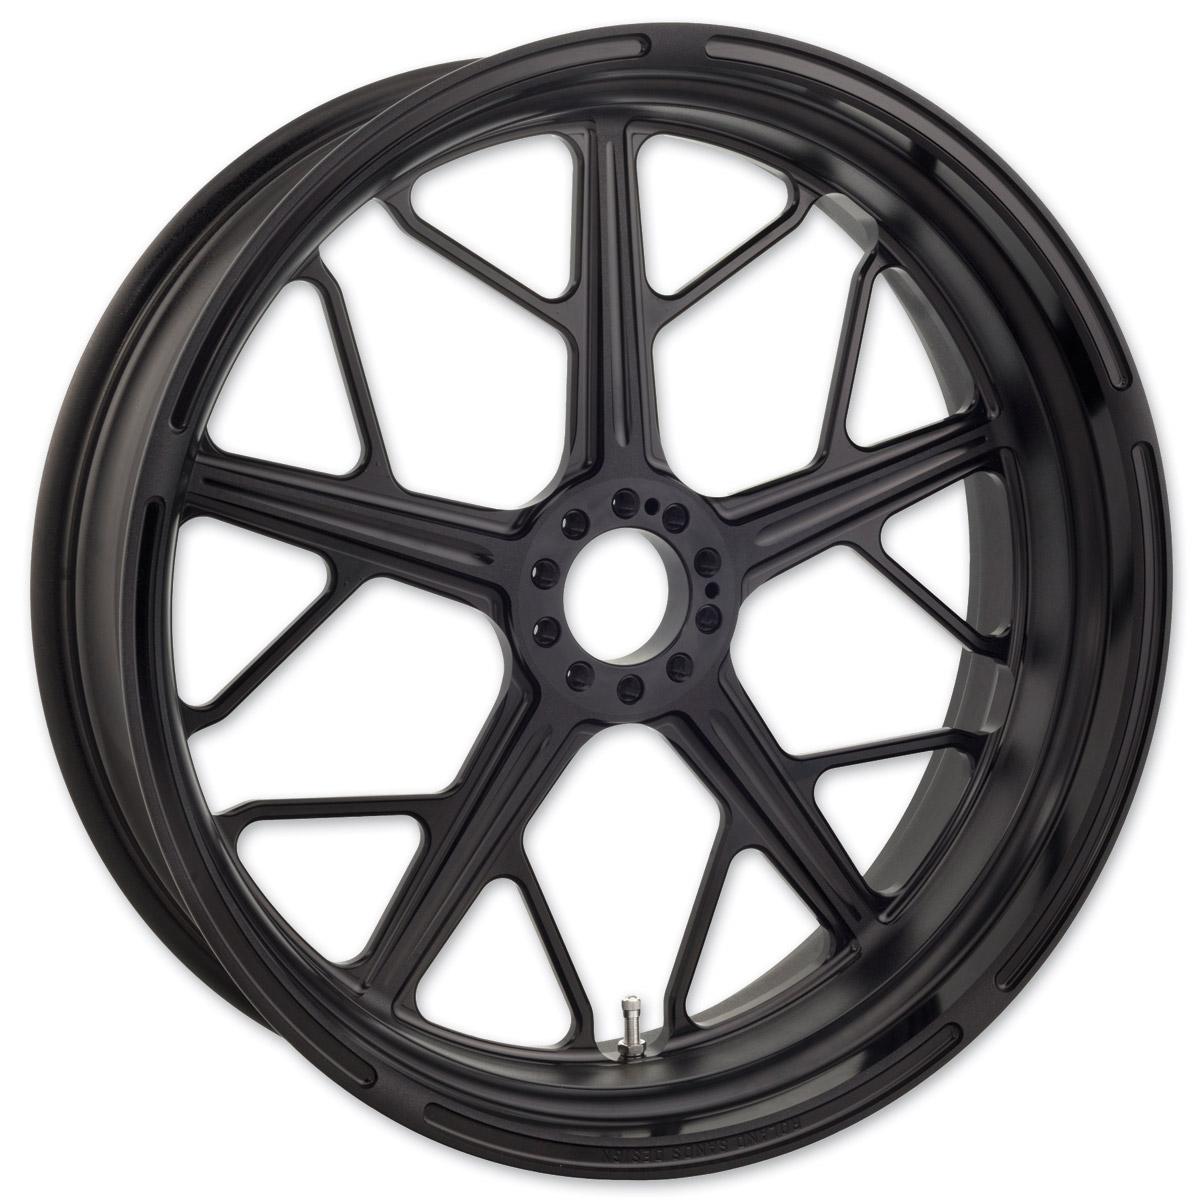 Roland Sands Design Hutch Black Ops  ABS Rear Wheel, 18″ x 5.5″